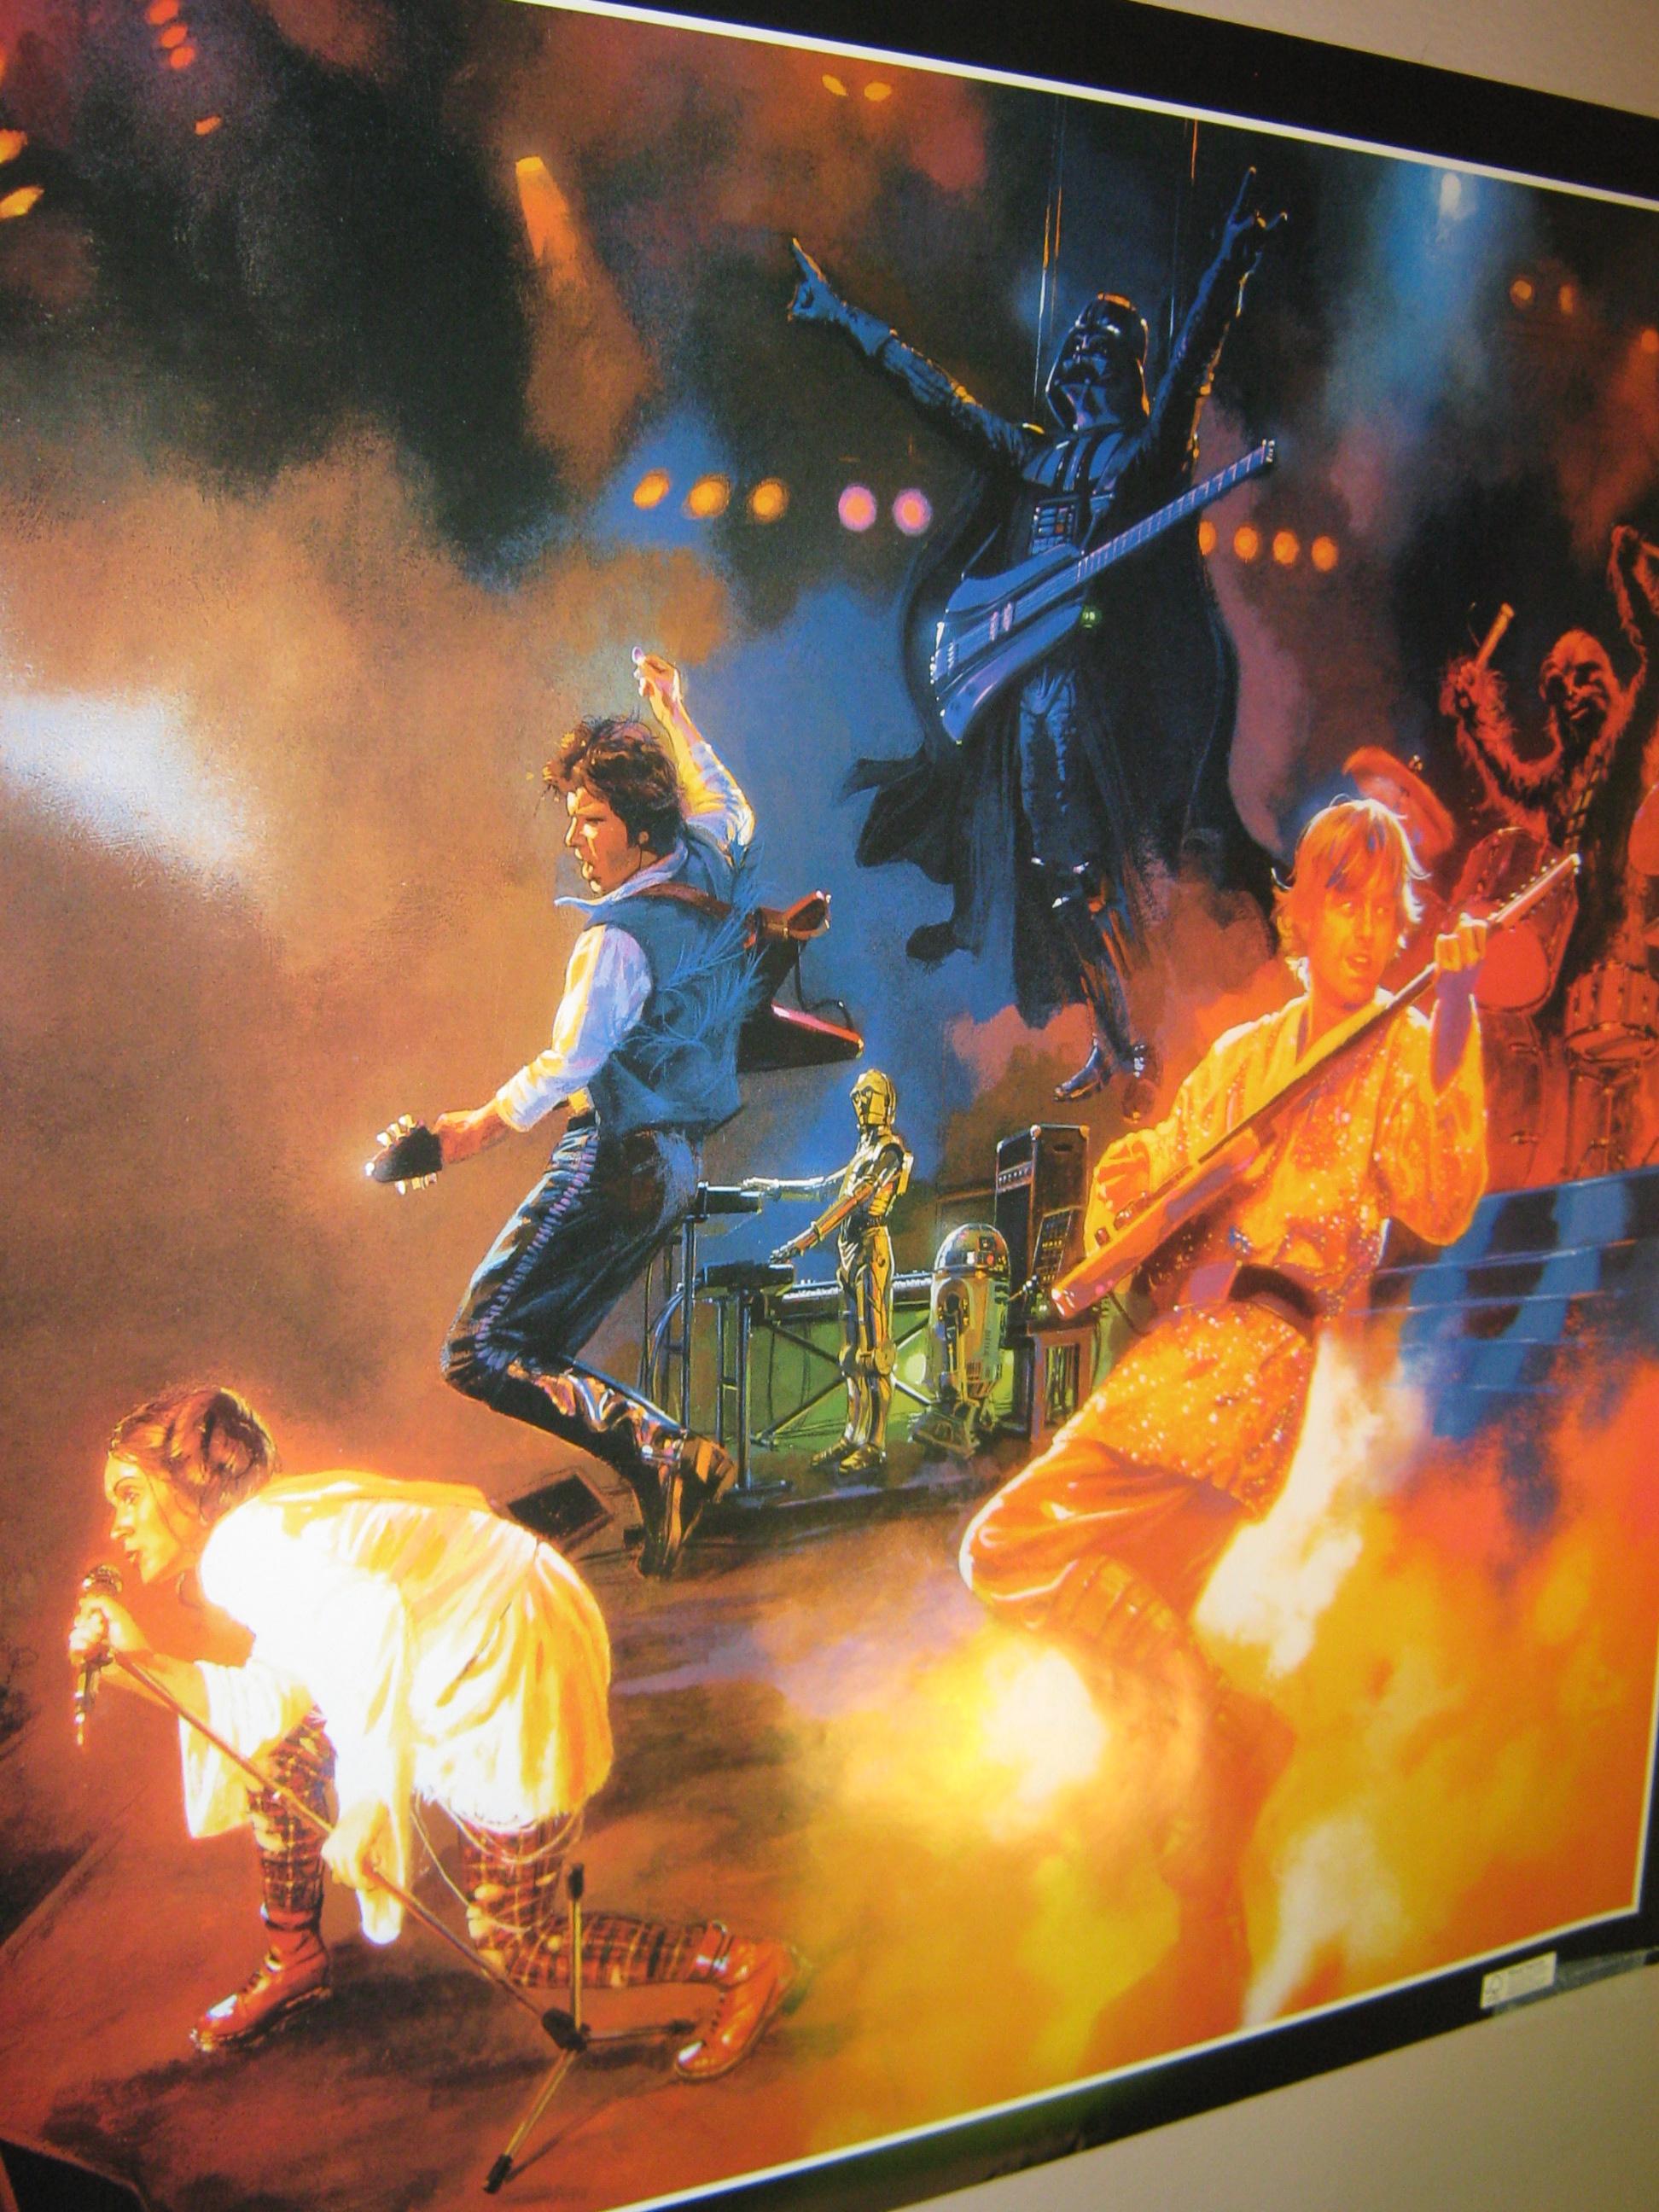 star wars rocks - band by limegreensquid on deviantart